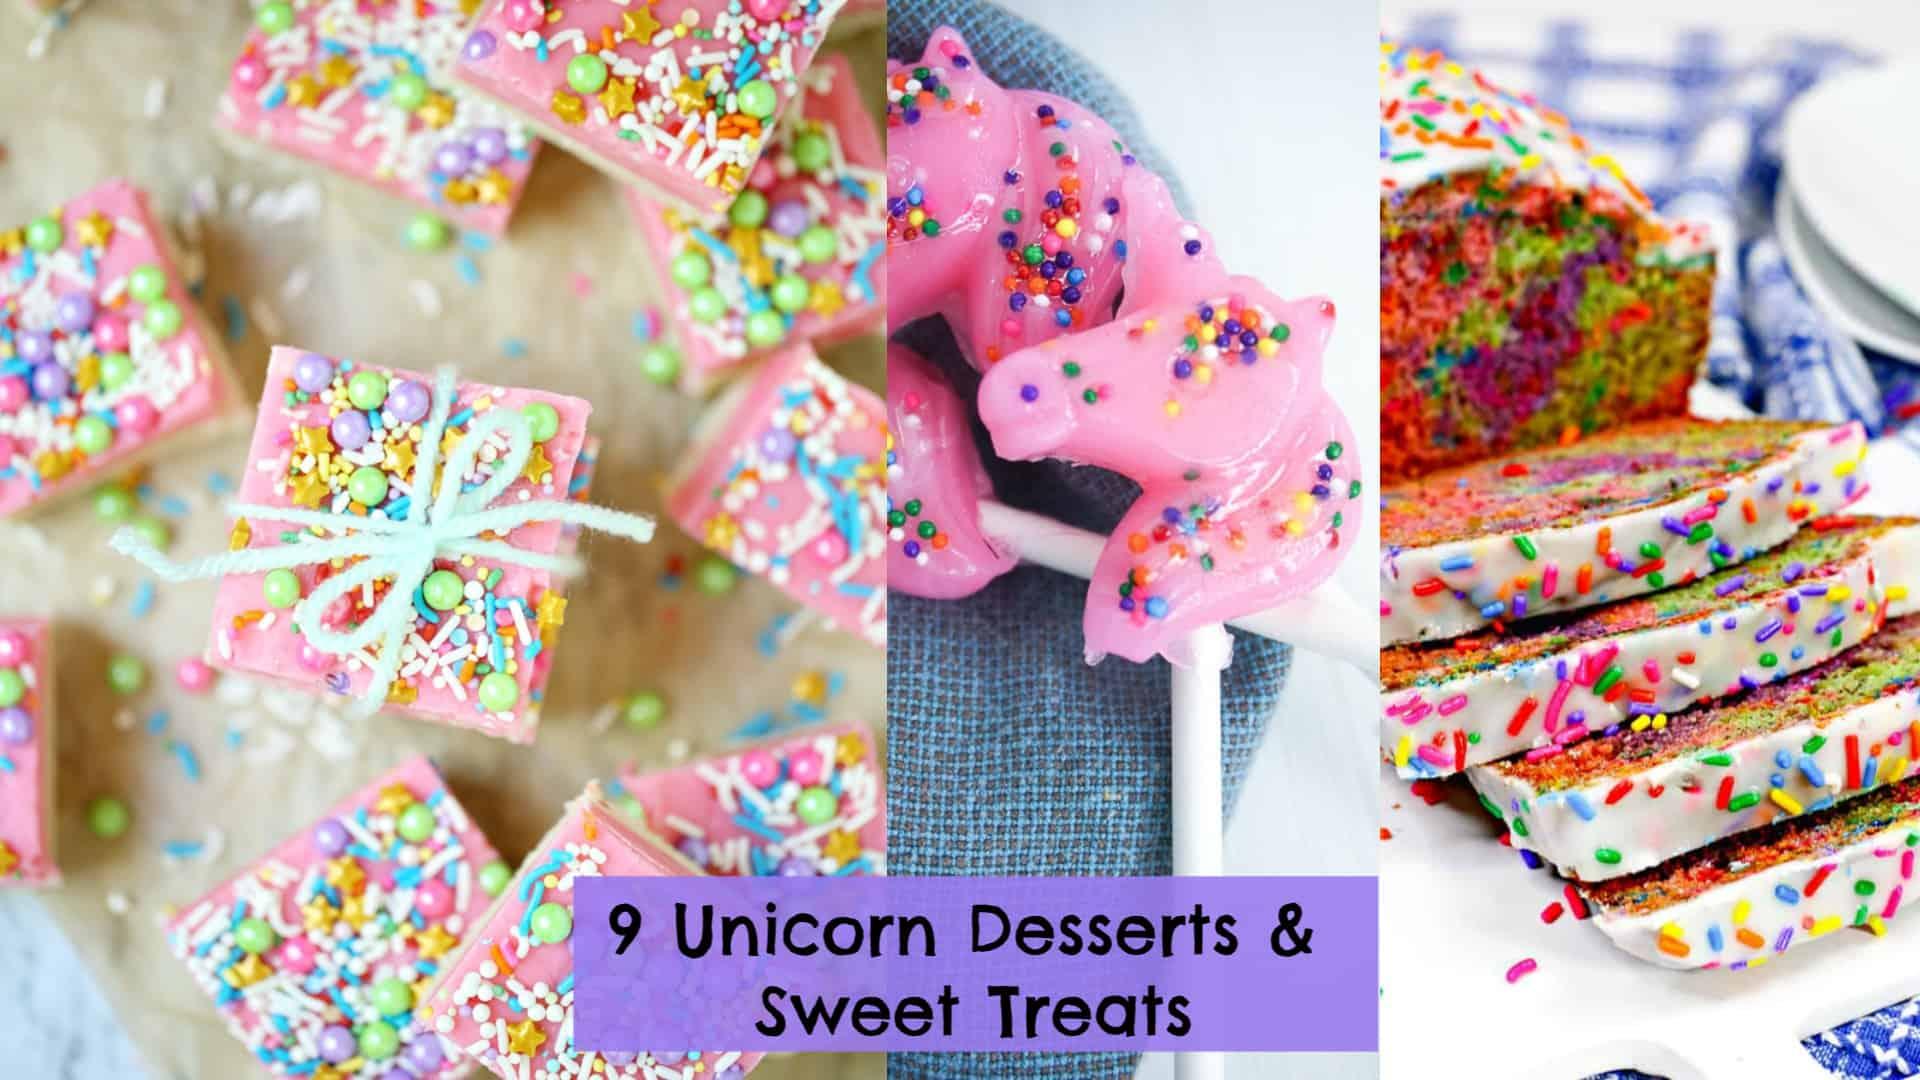 9 Unicorn Party Food Ideas: Popcorn, Rice Krispie Treats, & Fudge